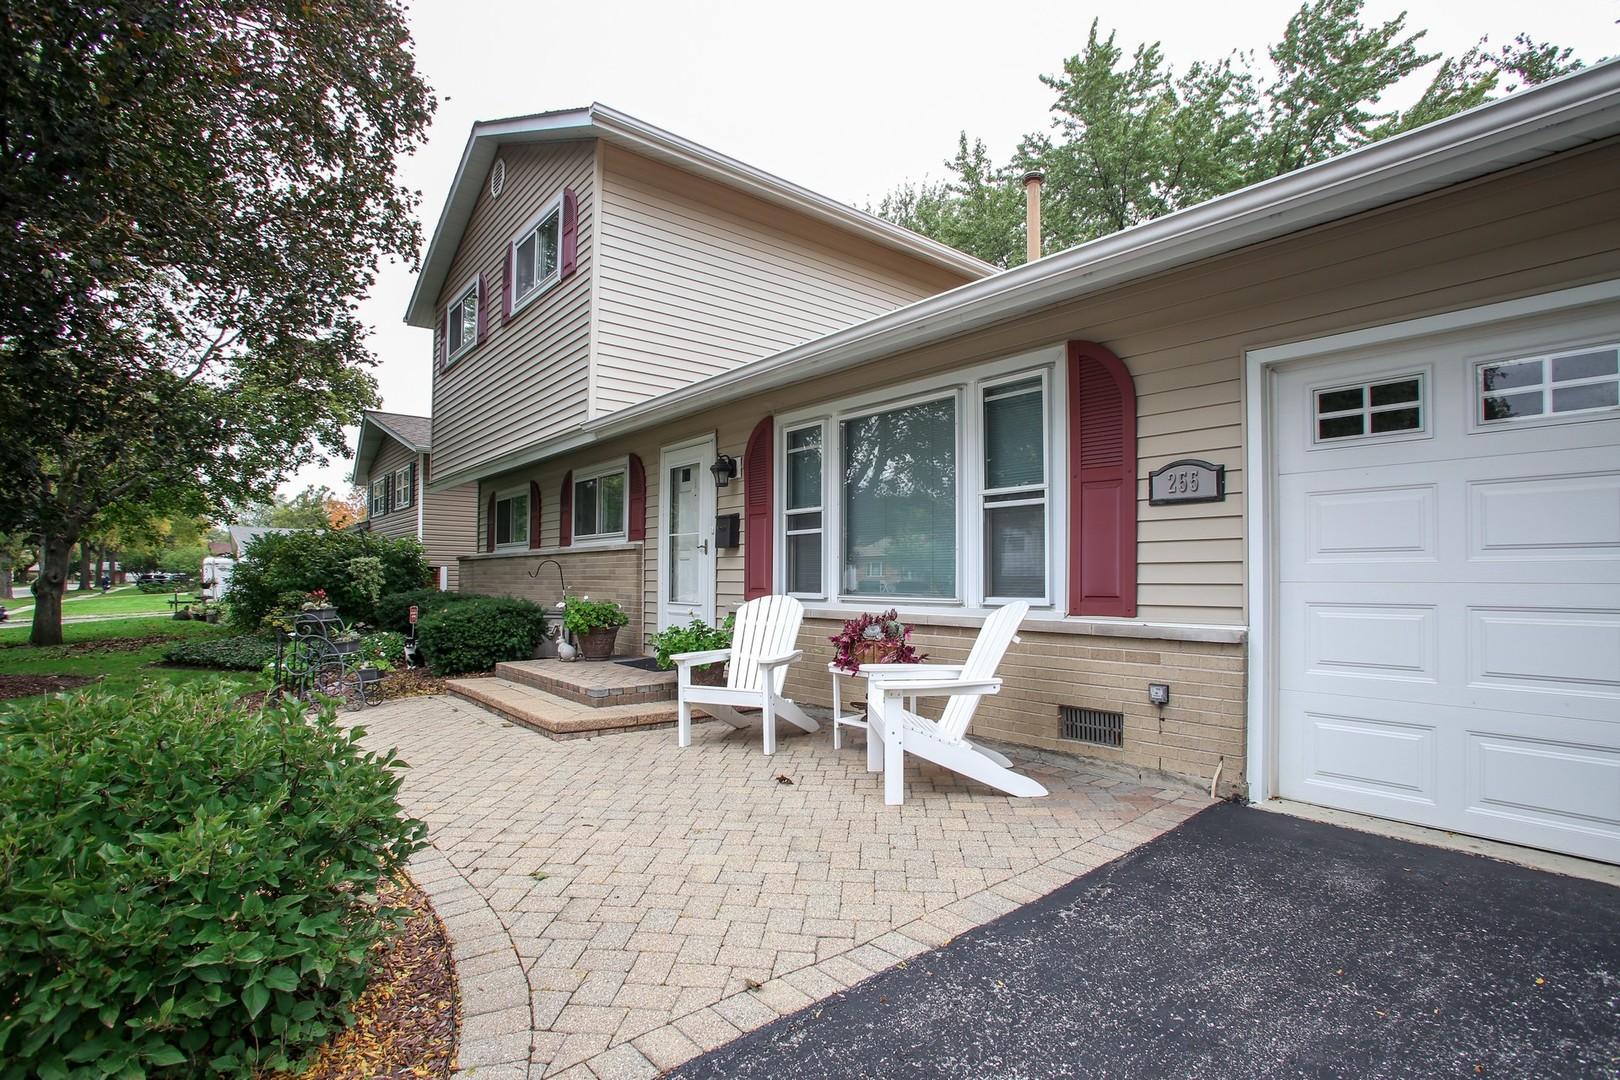 255 Fleetwood, ELK GROVE VILLAGE, Illinois, 60007